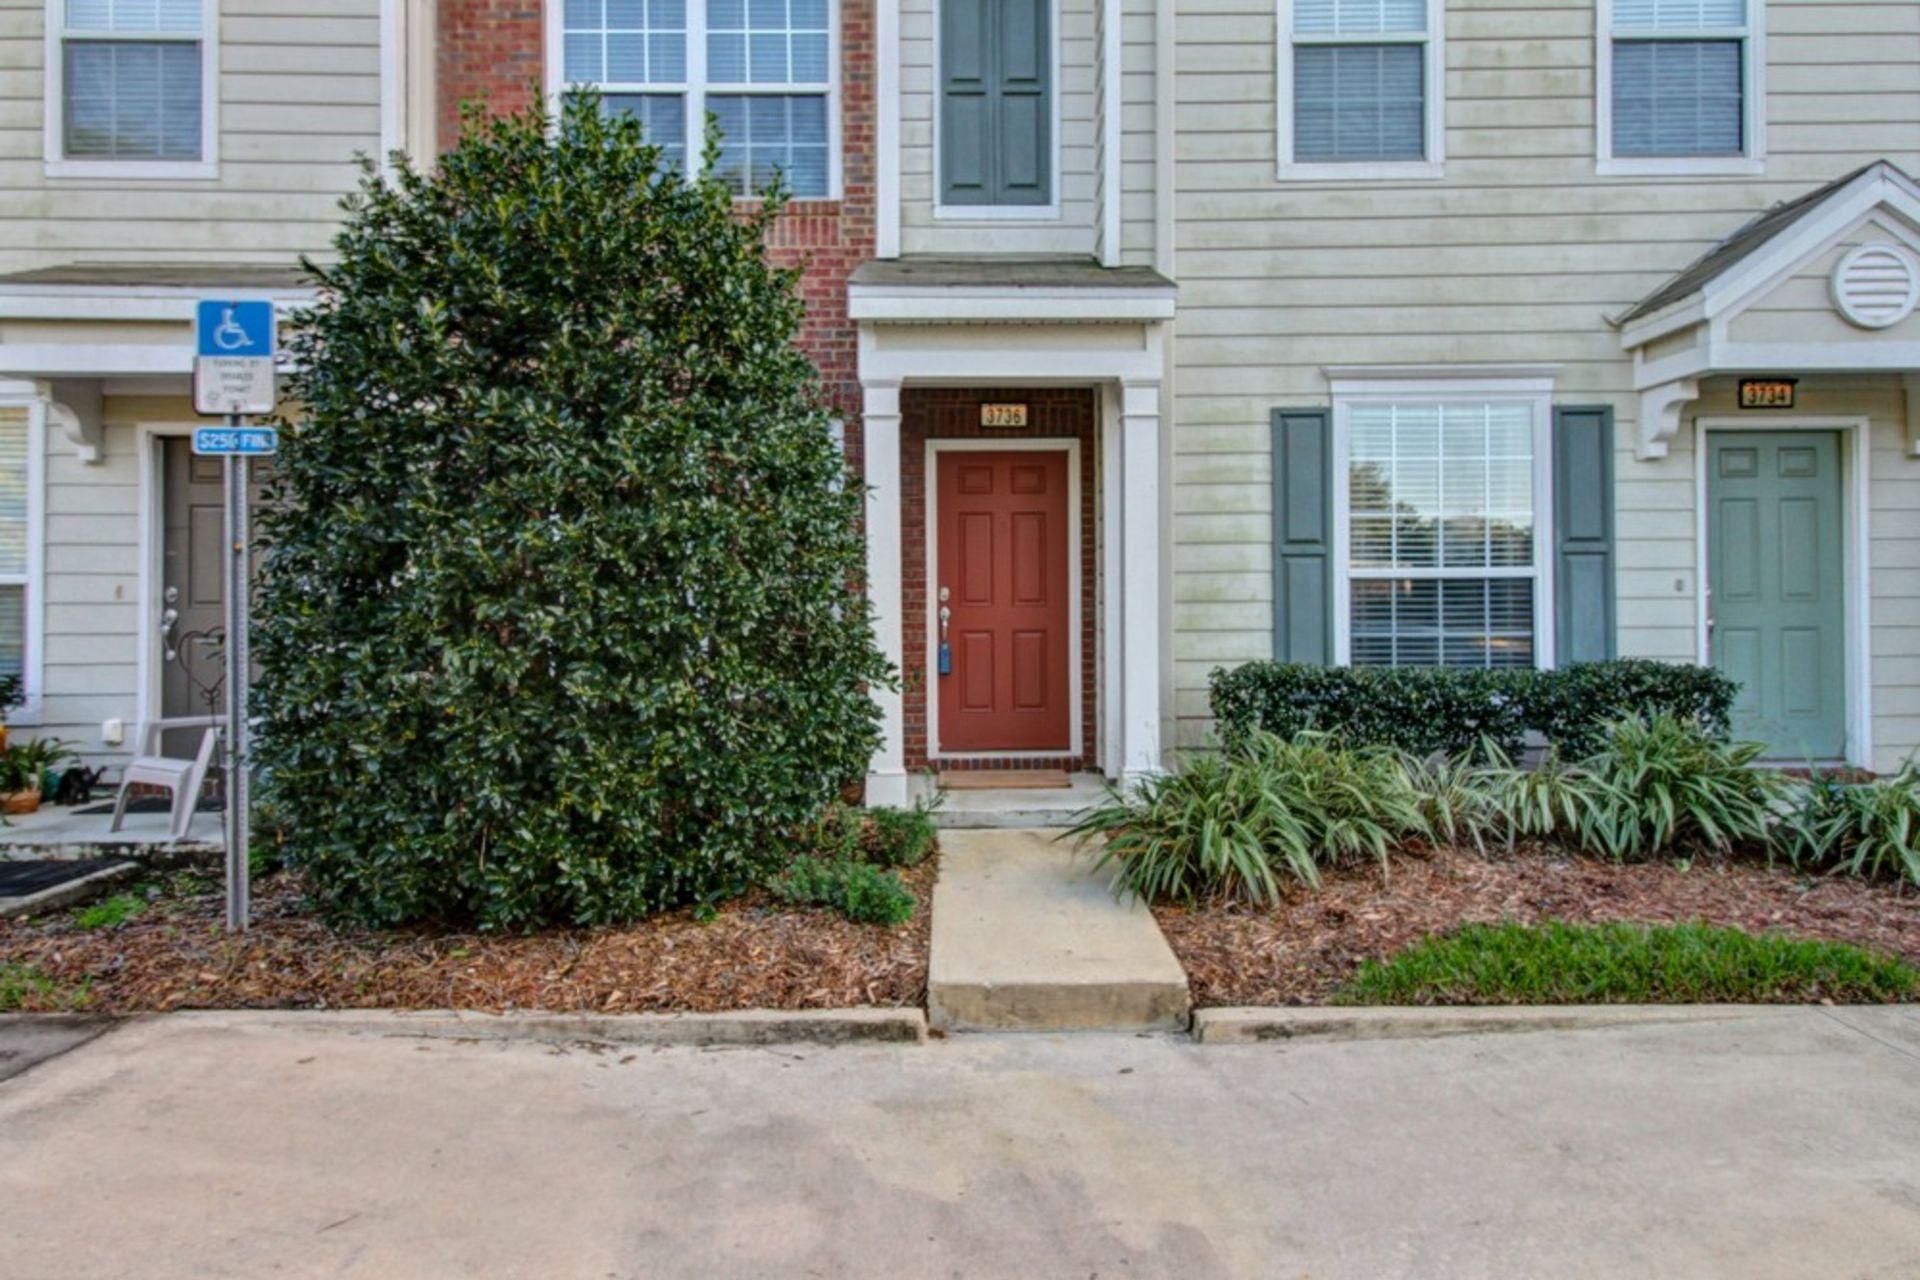 $137,900-PRICE IMPROVEMENT-3736 Summerlin Ln. E., Jacksonville, FL 32224